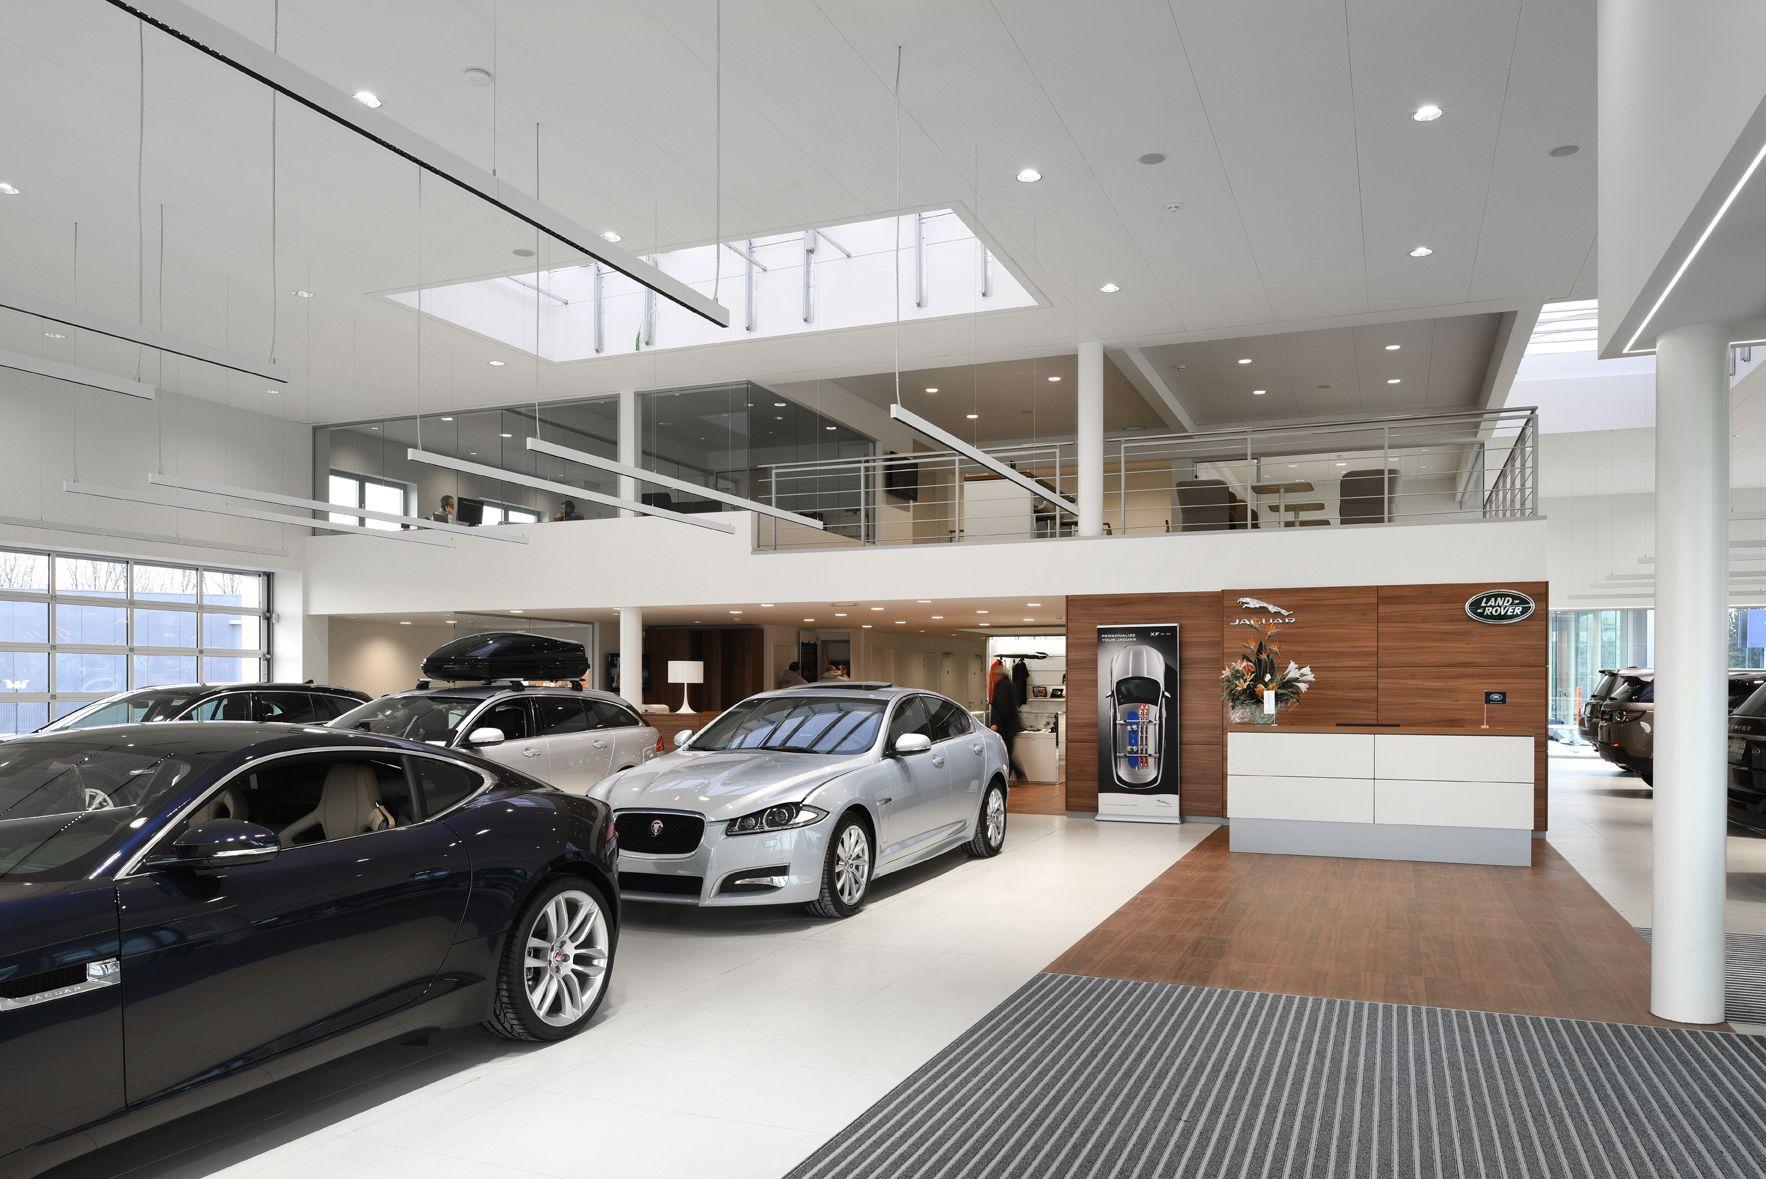 Show Room Jaguar Www Fcmarchitects Be Jaguar Land Rover Jaguar Land Rover